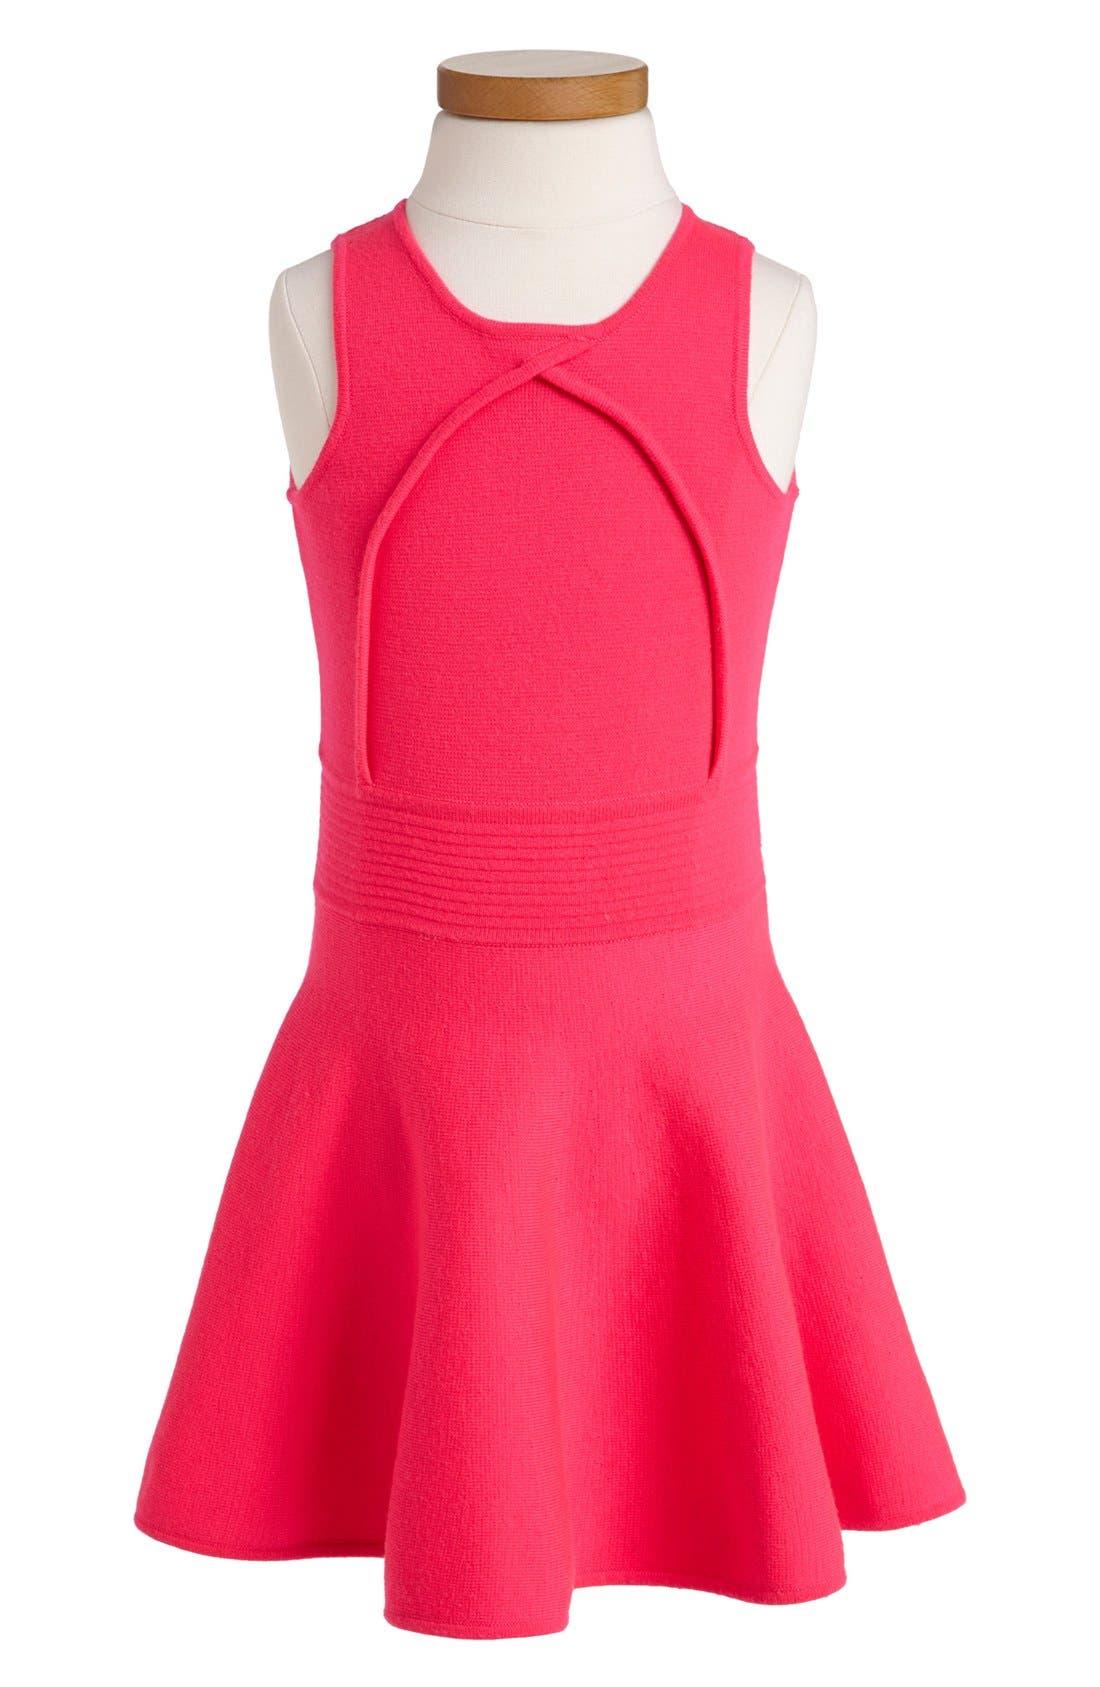 Alternate Image 1 Selected - Milly Minis Pleated Flare Dress (Toddler Girls, Little Girls & Big Girls)